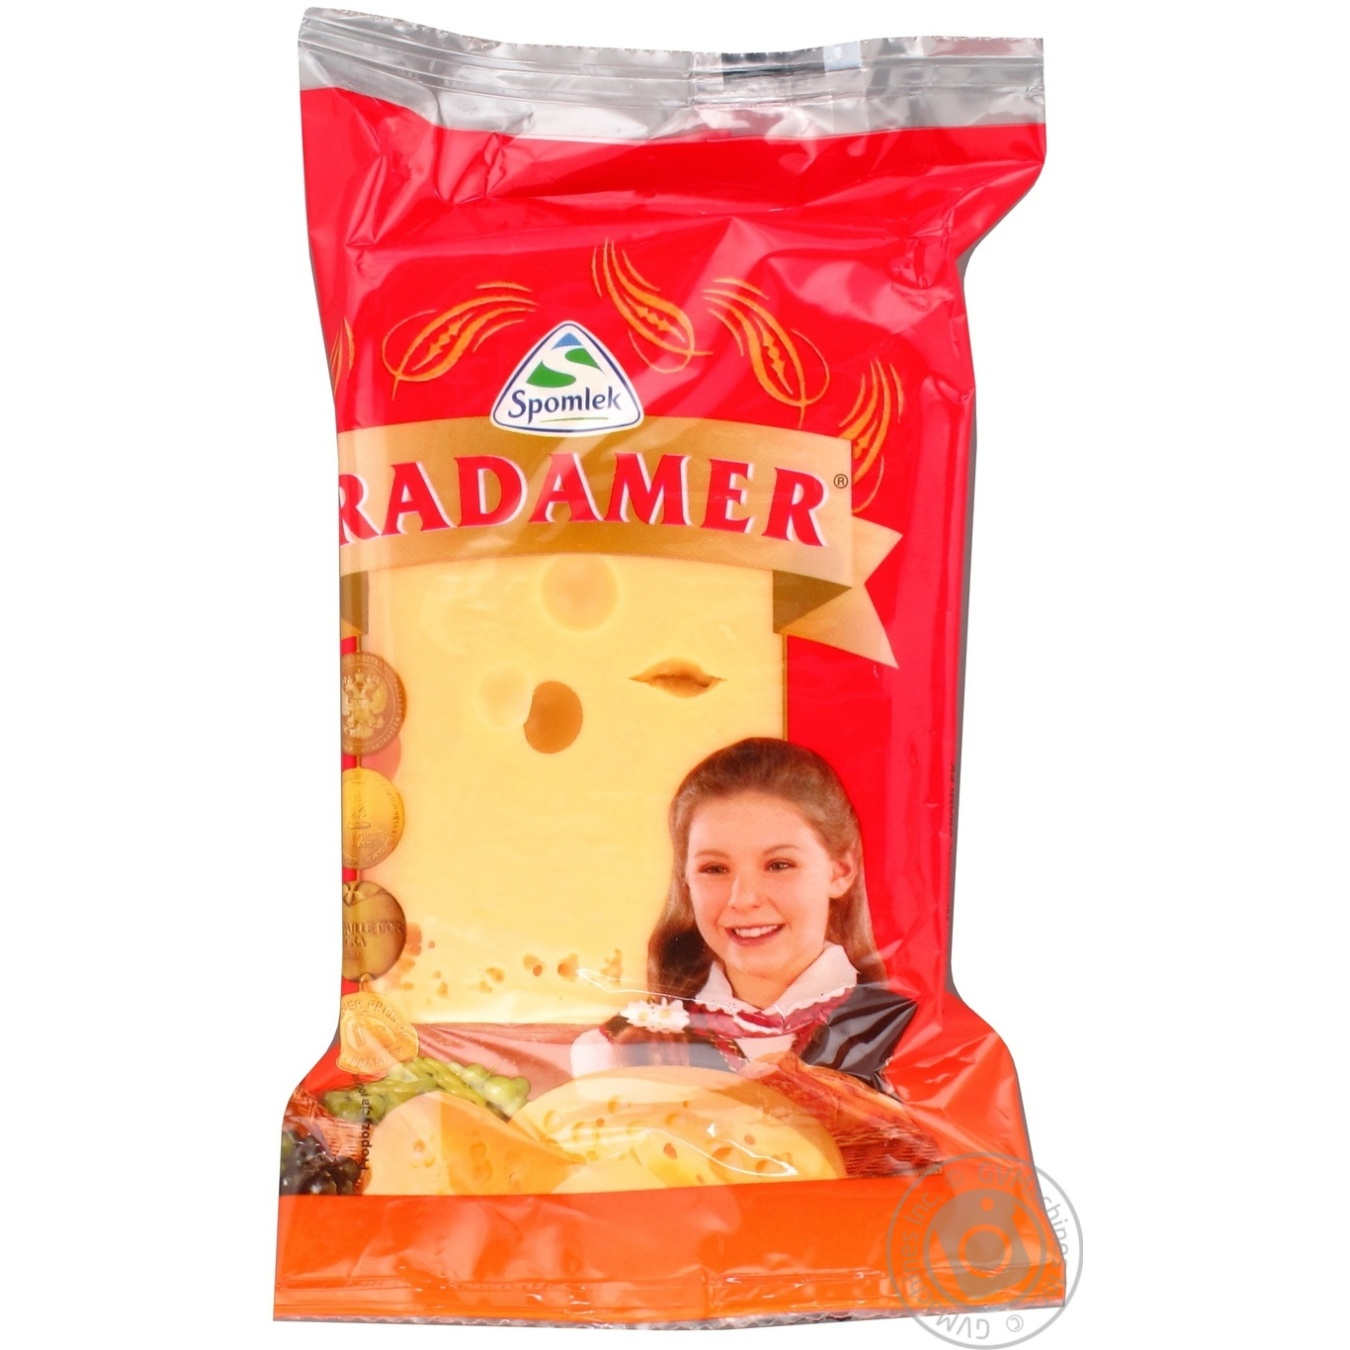 Сыр Спомлек Радомер твёрдый 45% 200г